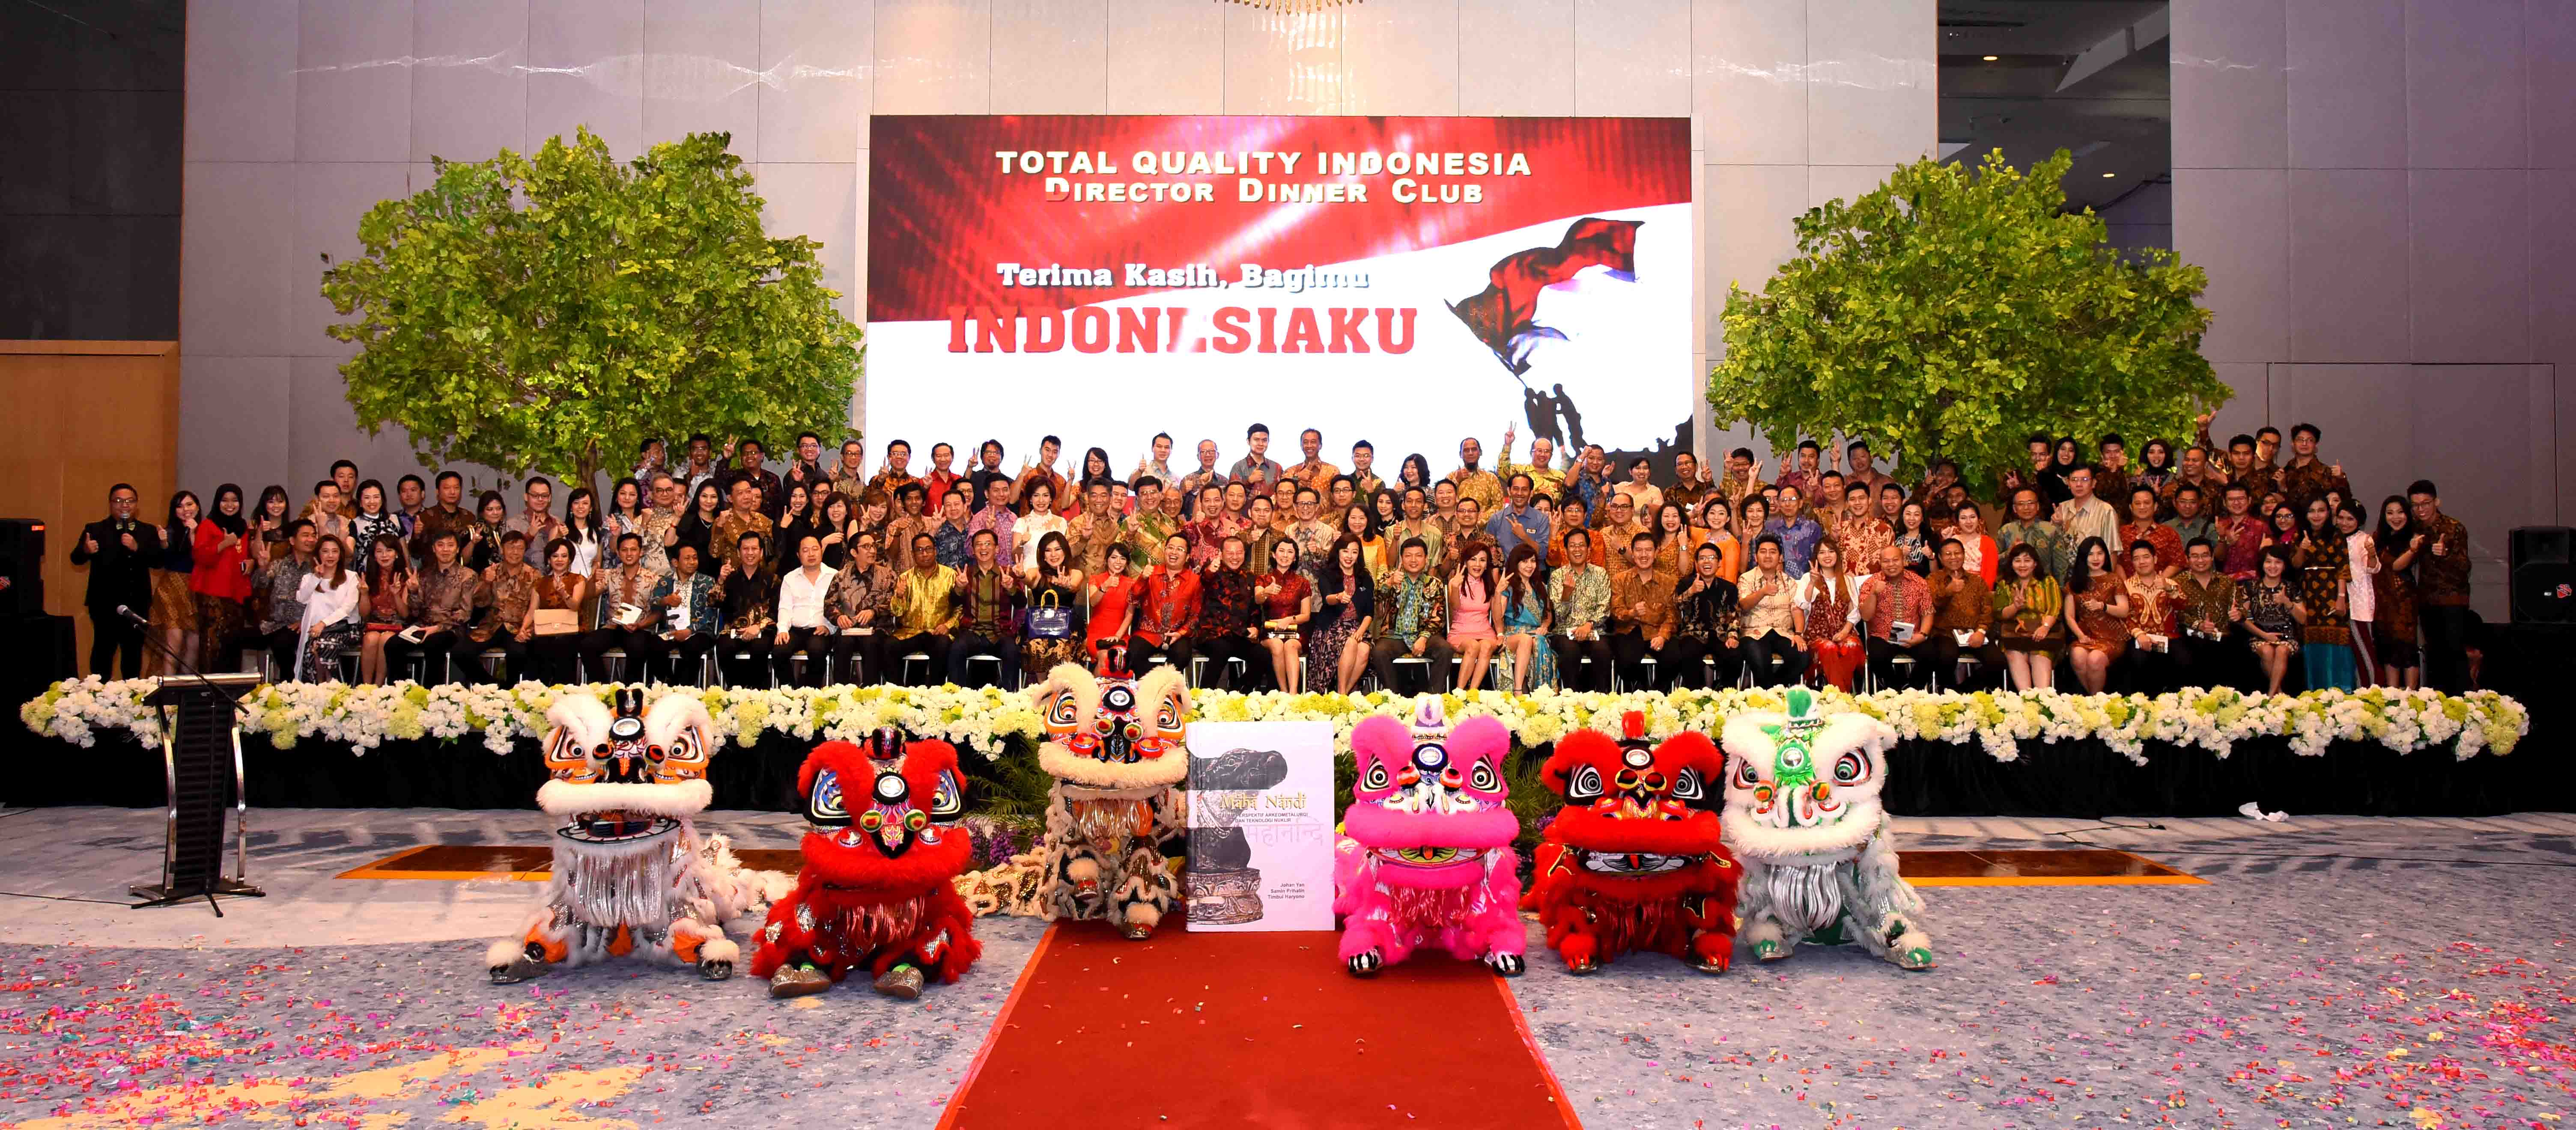 Director Dinner Club : Terima Kasih, Bagimu Indonesiaku